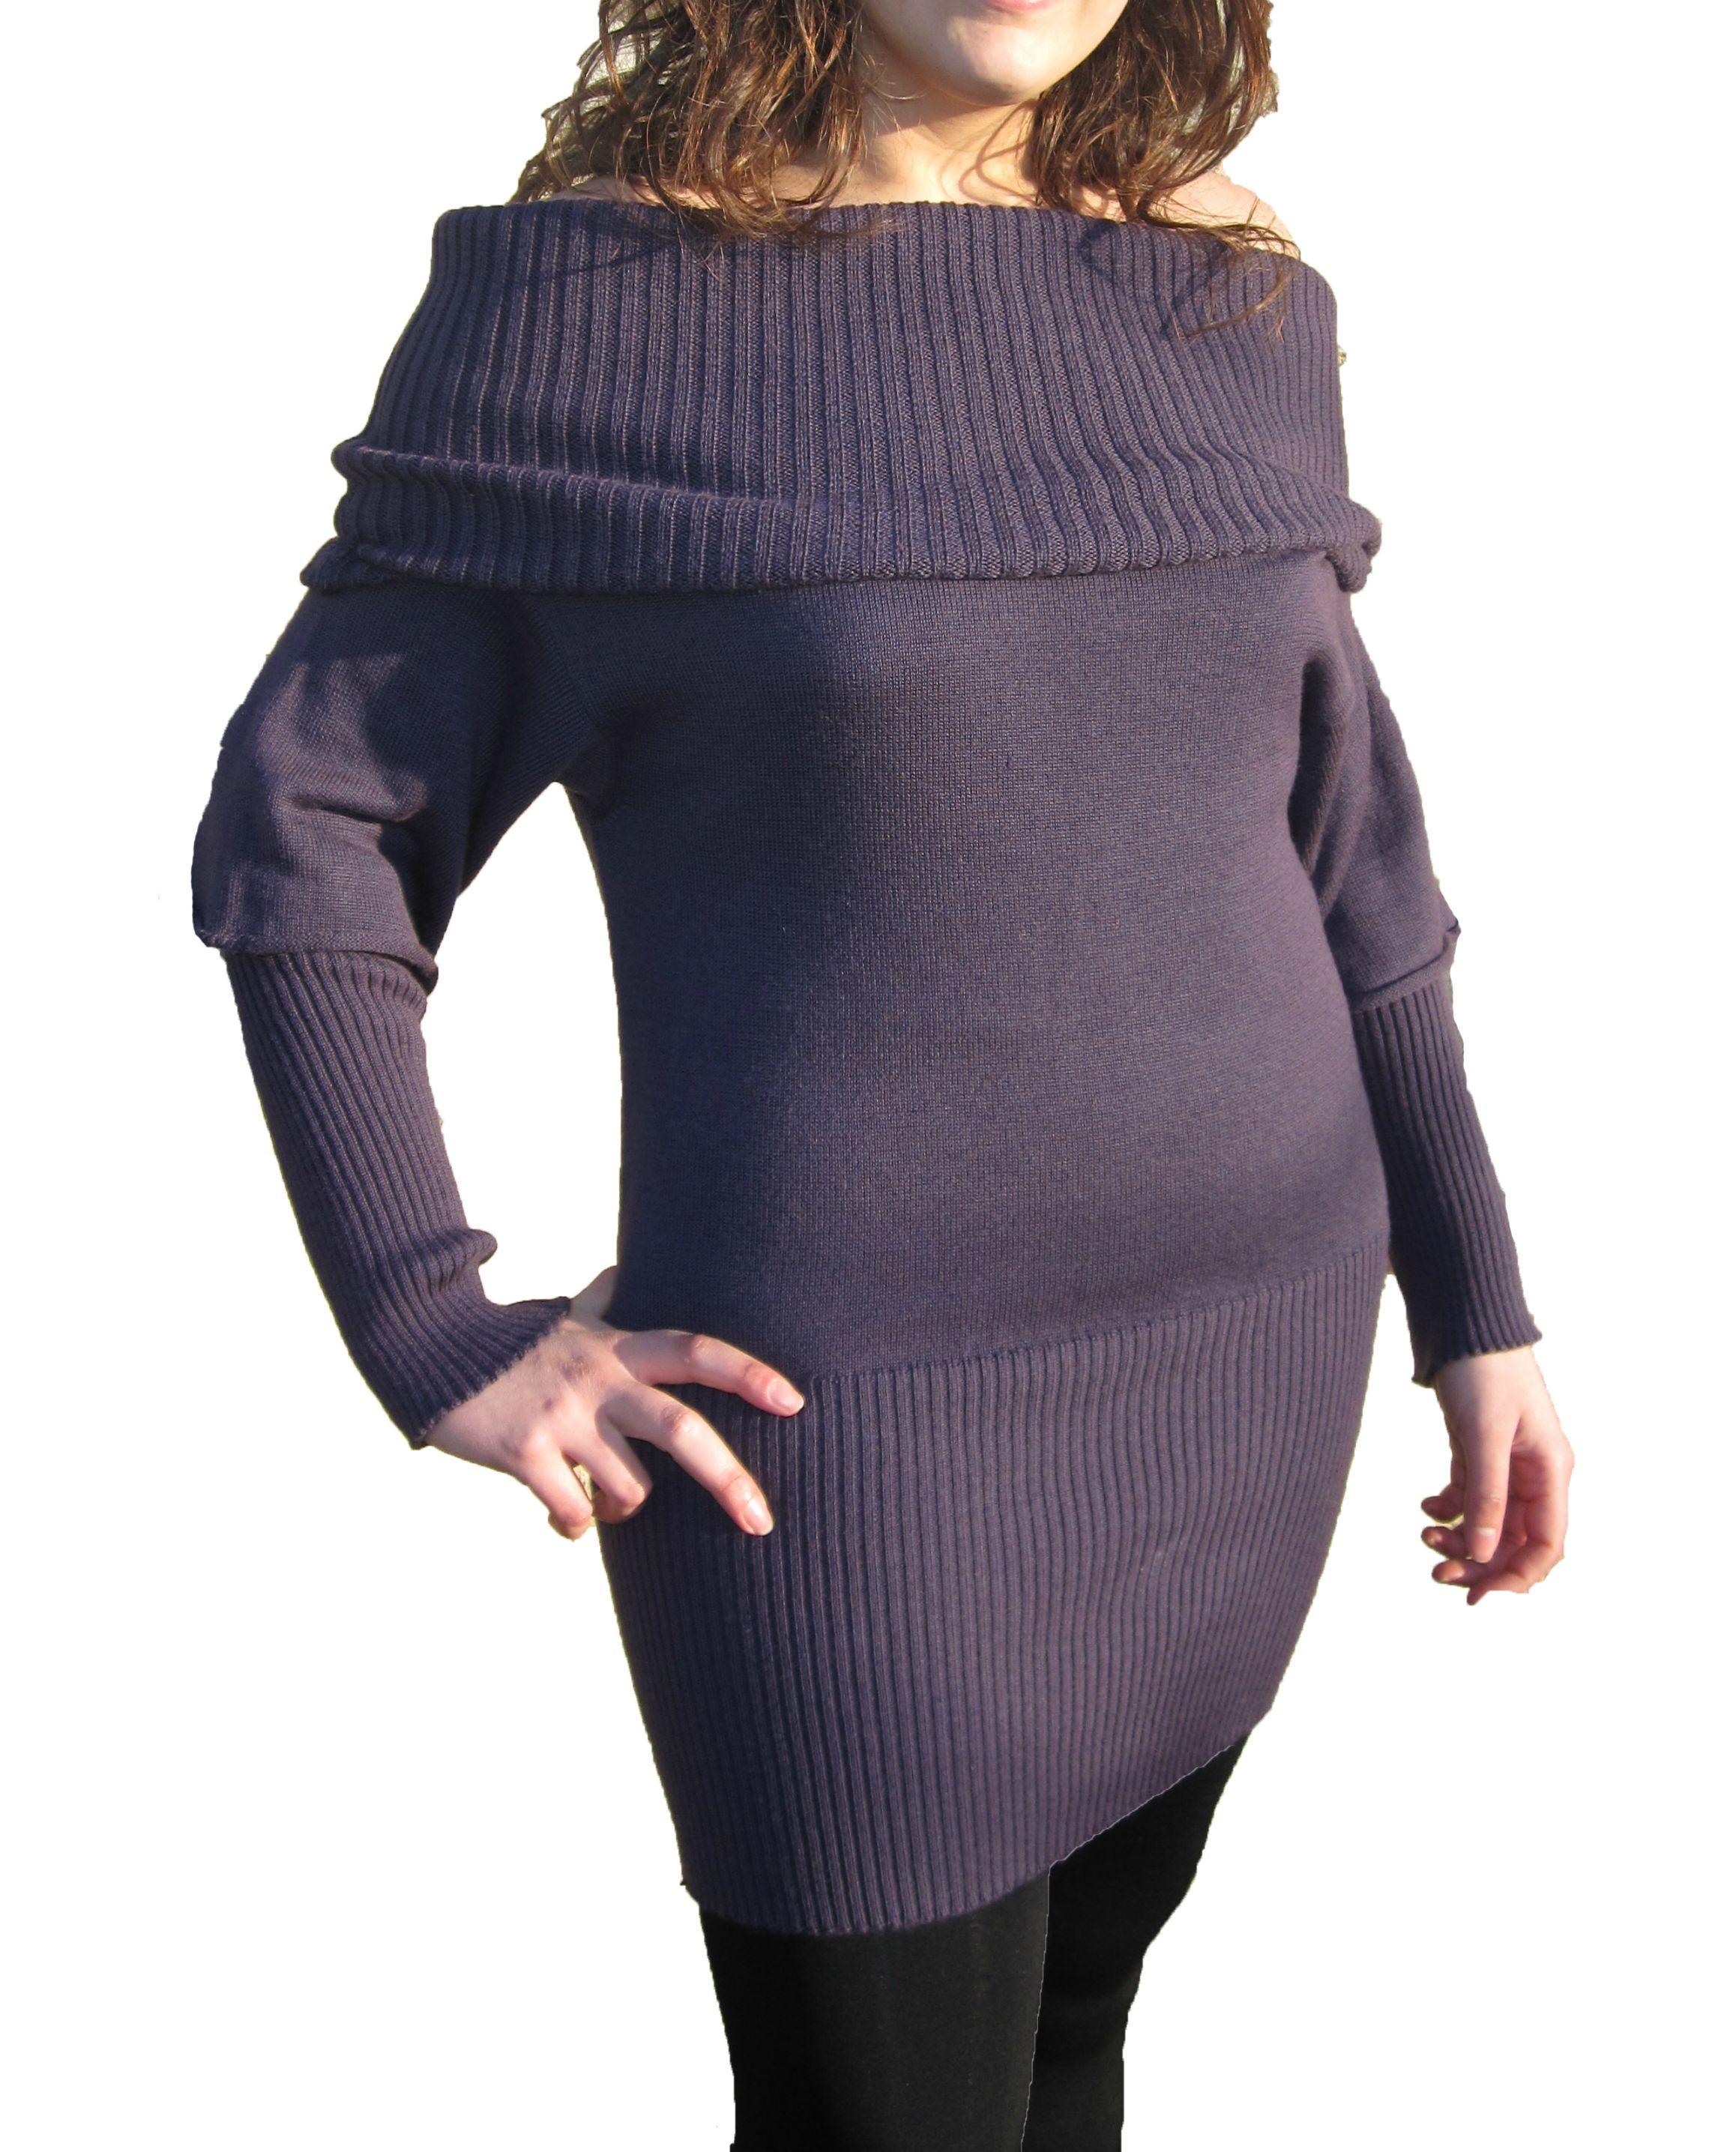 Knitwear Short Dress with Boat Neck - Violet